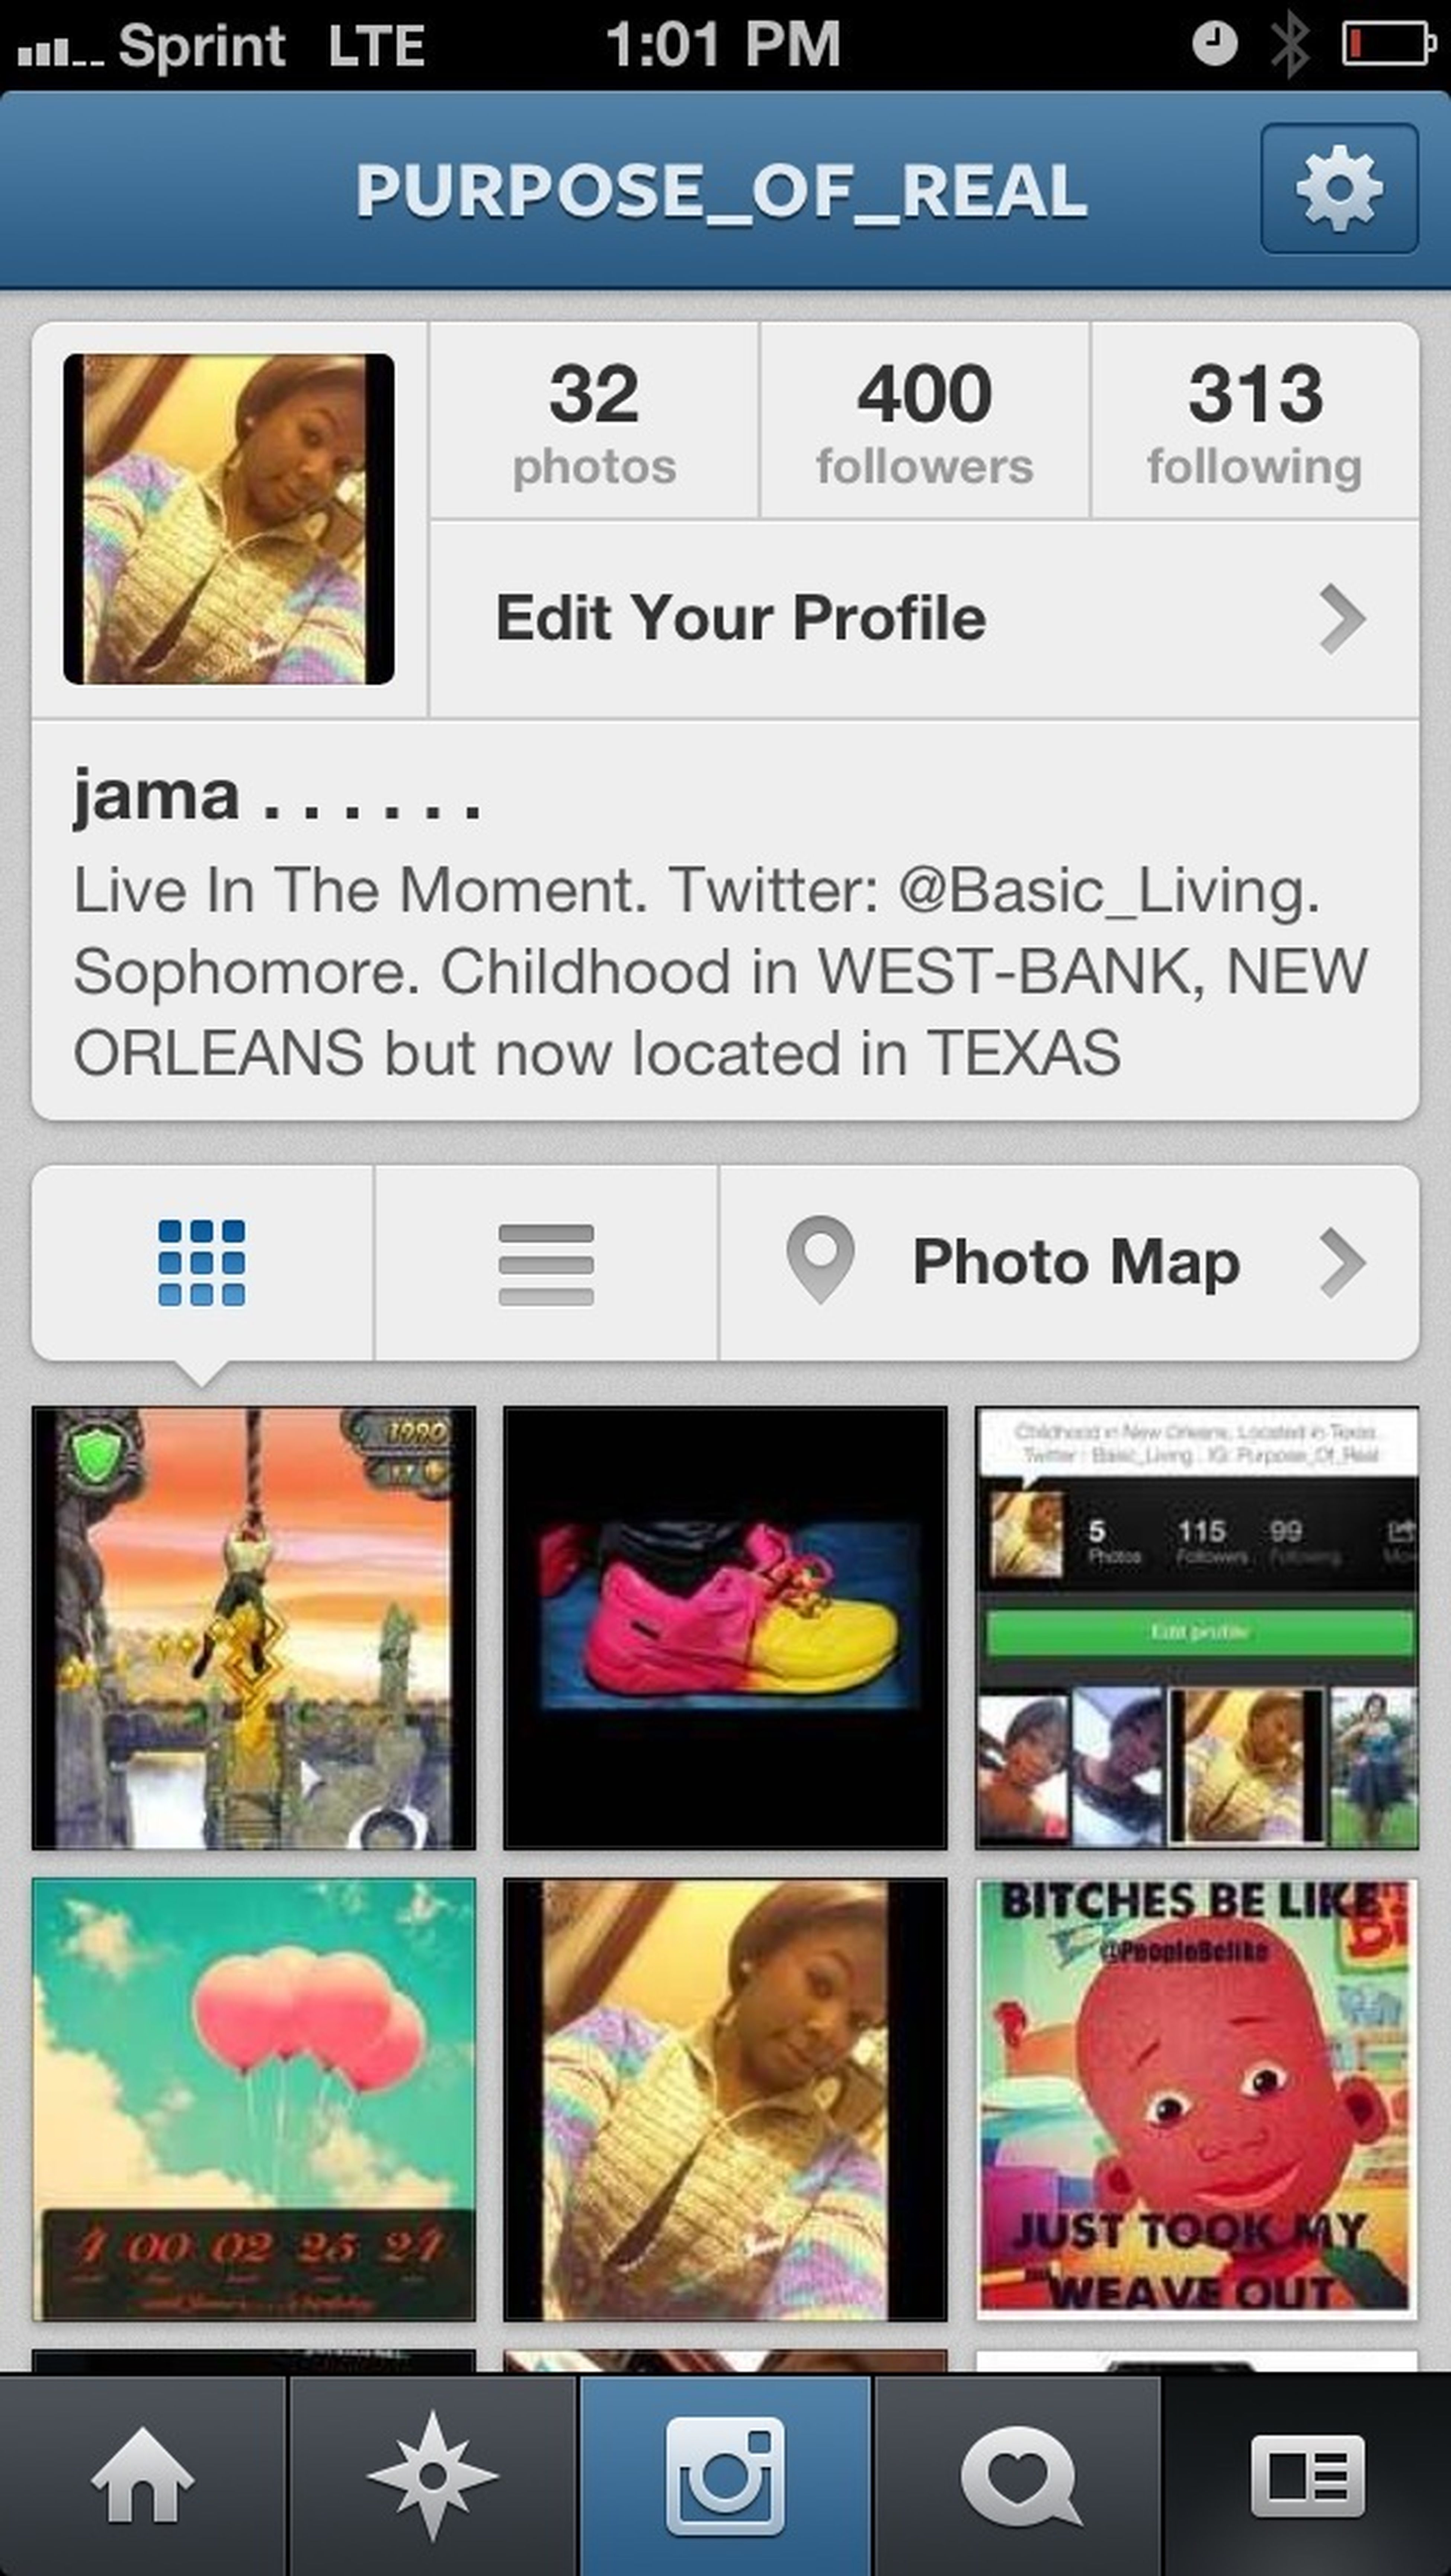 Go Follow @purpose_of_real & Ill Follow Back